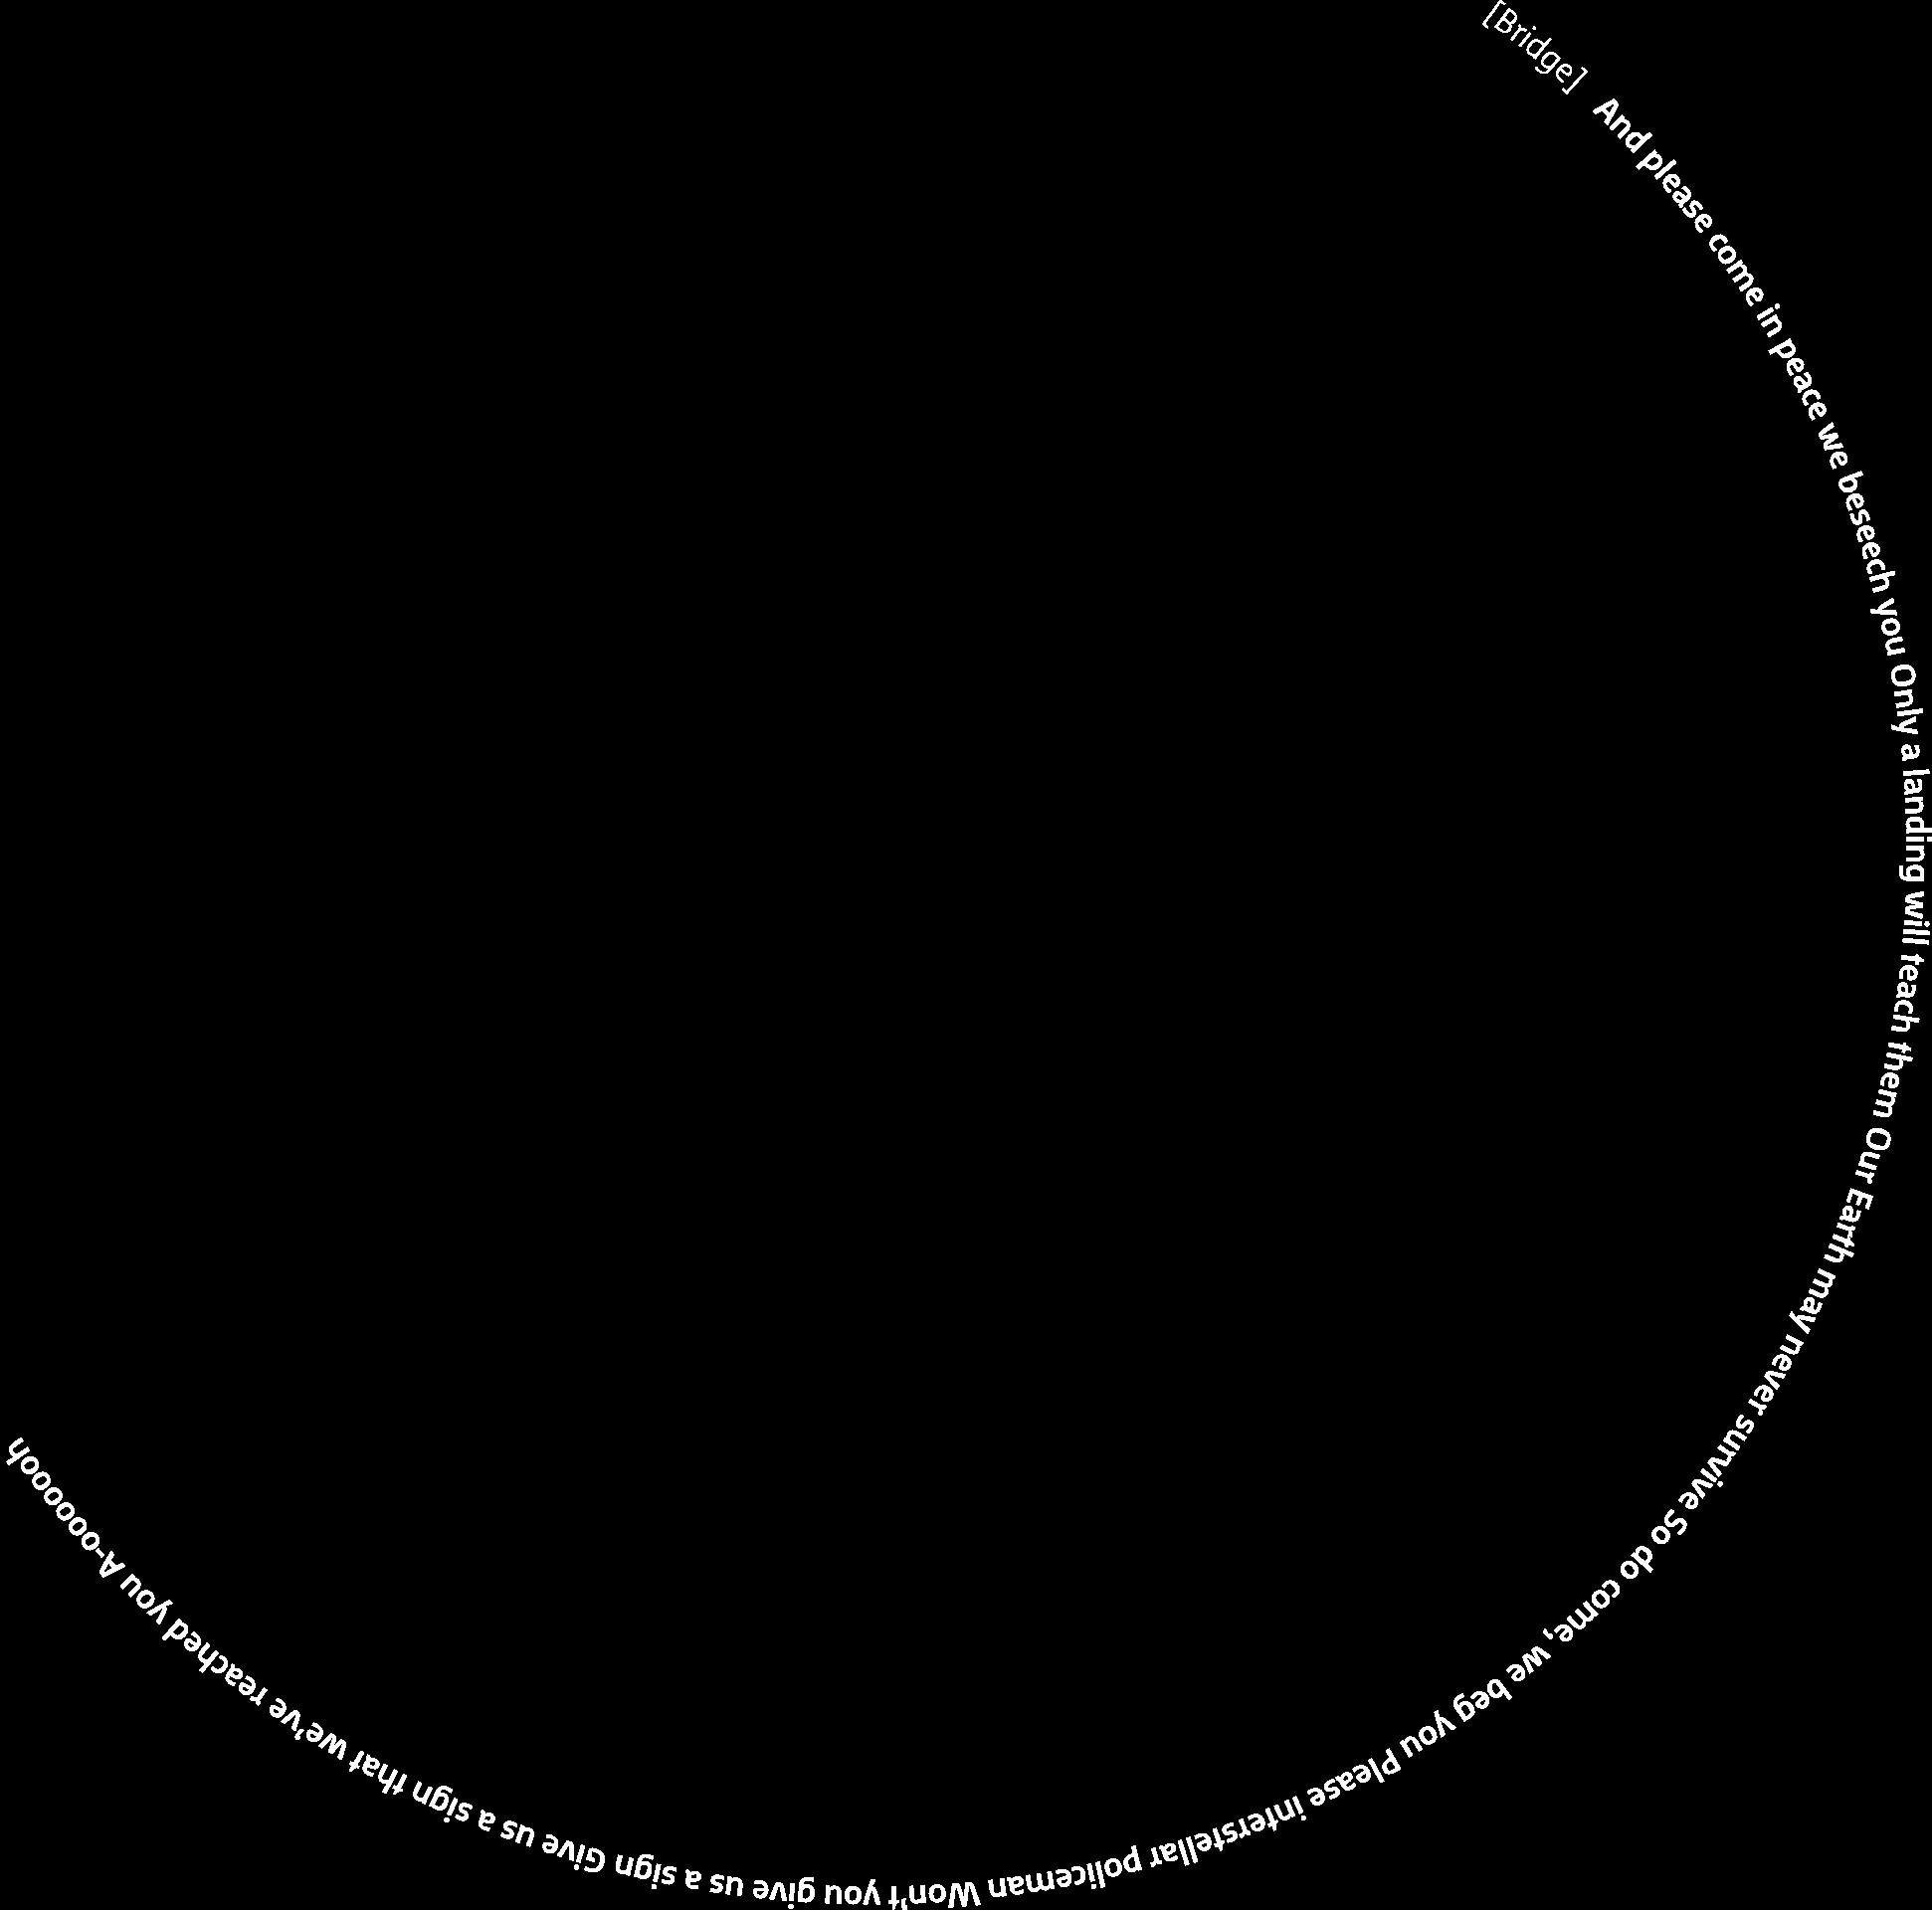 Image-Interstella-8